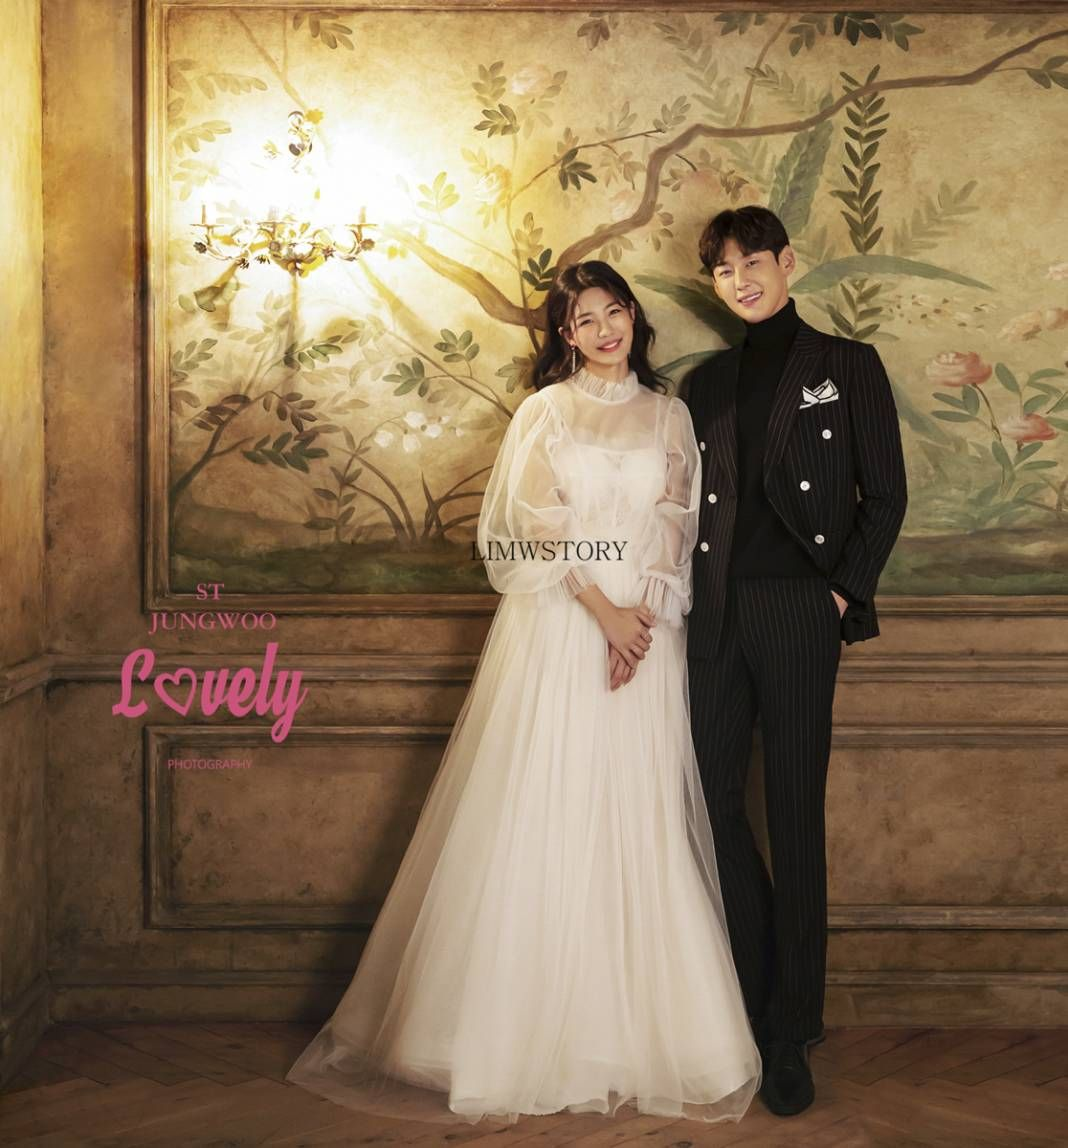 korea wedding photo 2020 new sample by ST jung woo